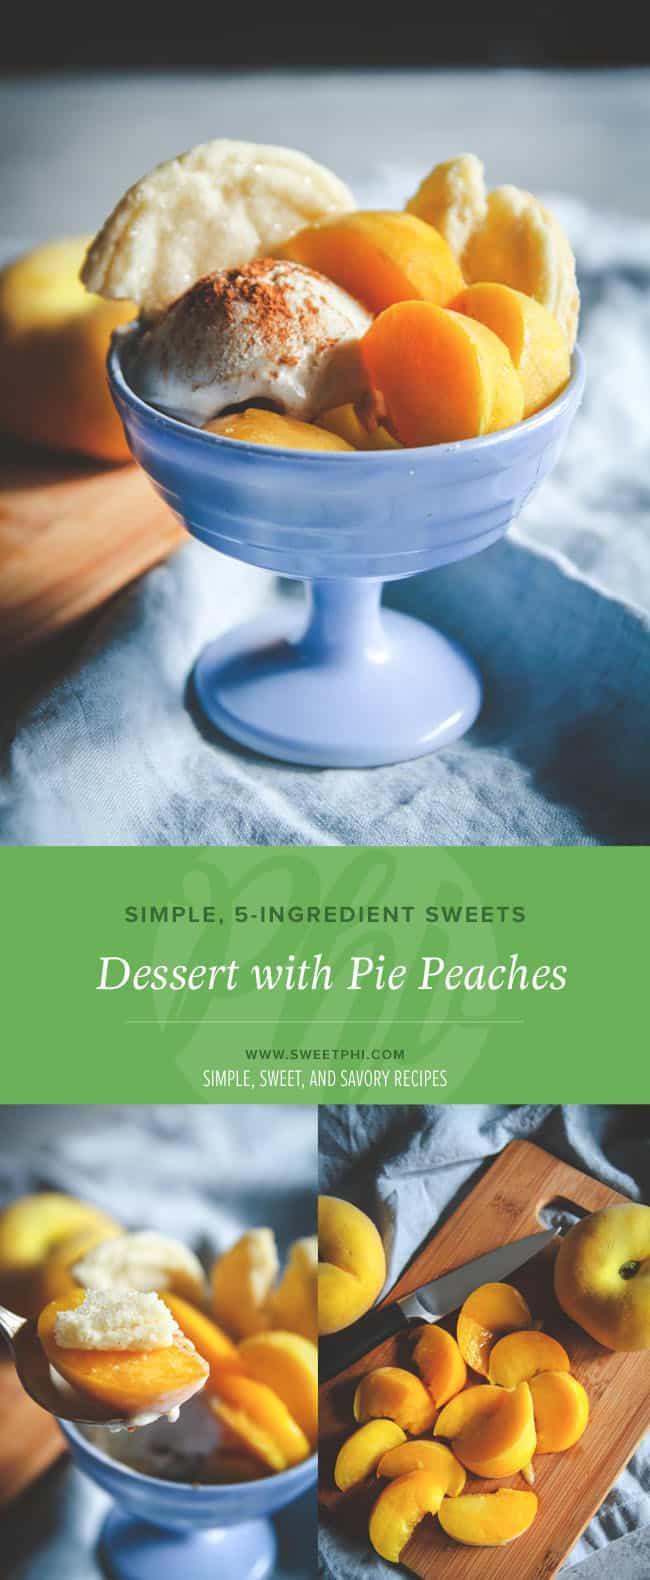 The best dessert recipe with pie peaches